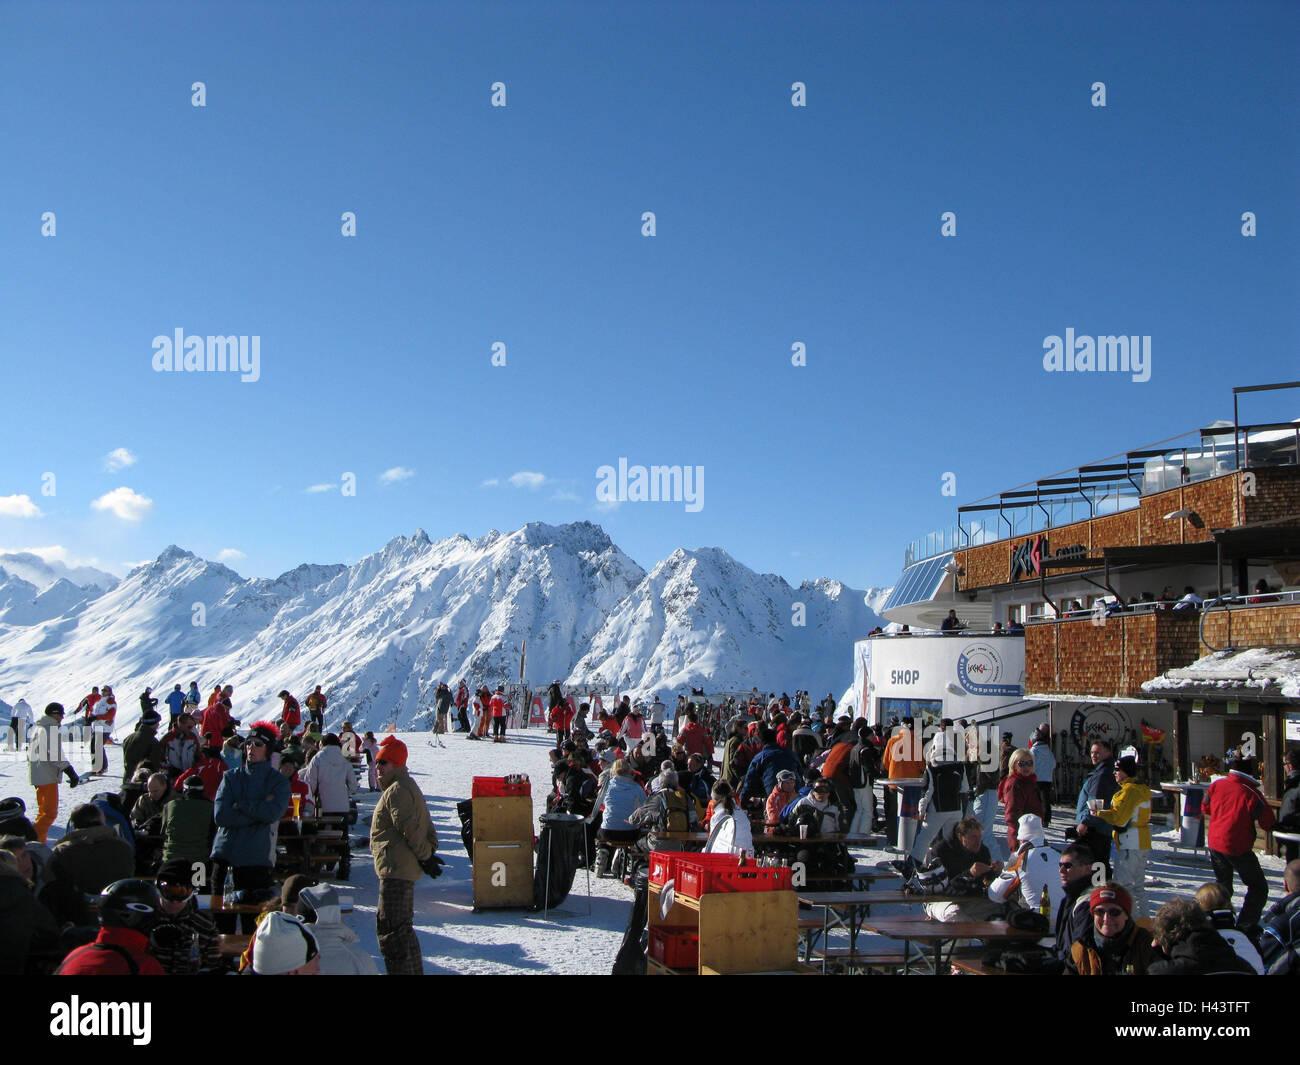 Austria, Tyrol, Silvrettagebiet, Ischgl, Idalpe, snack